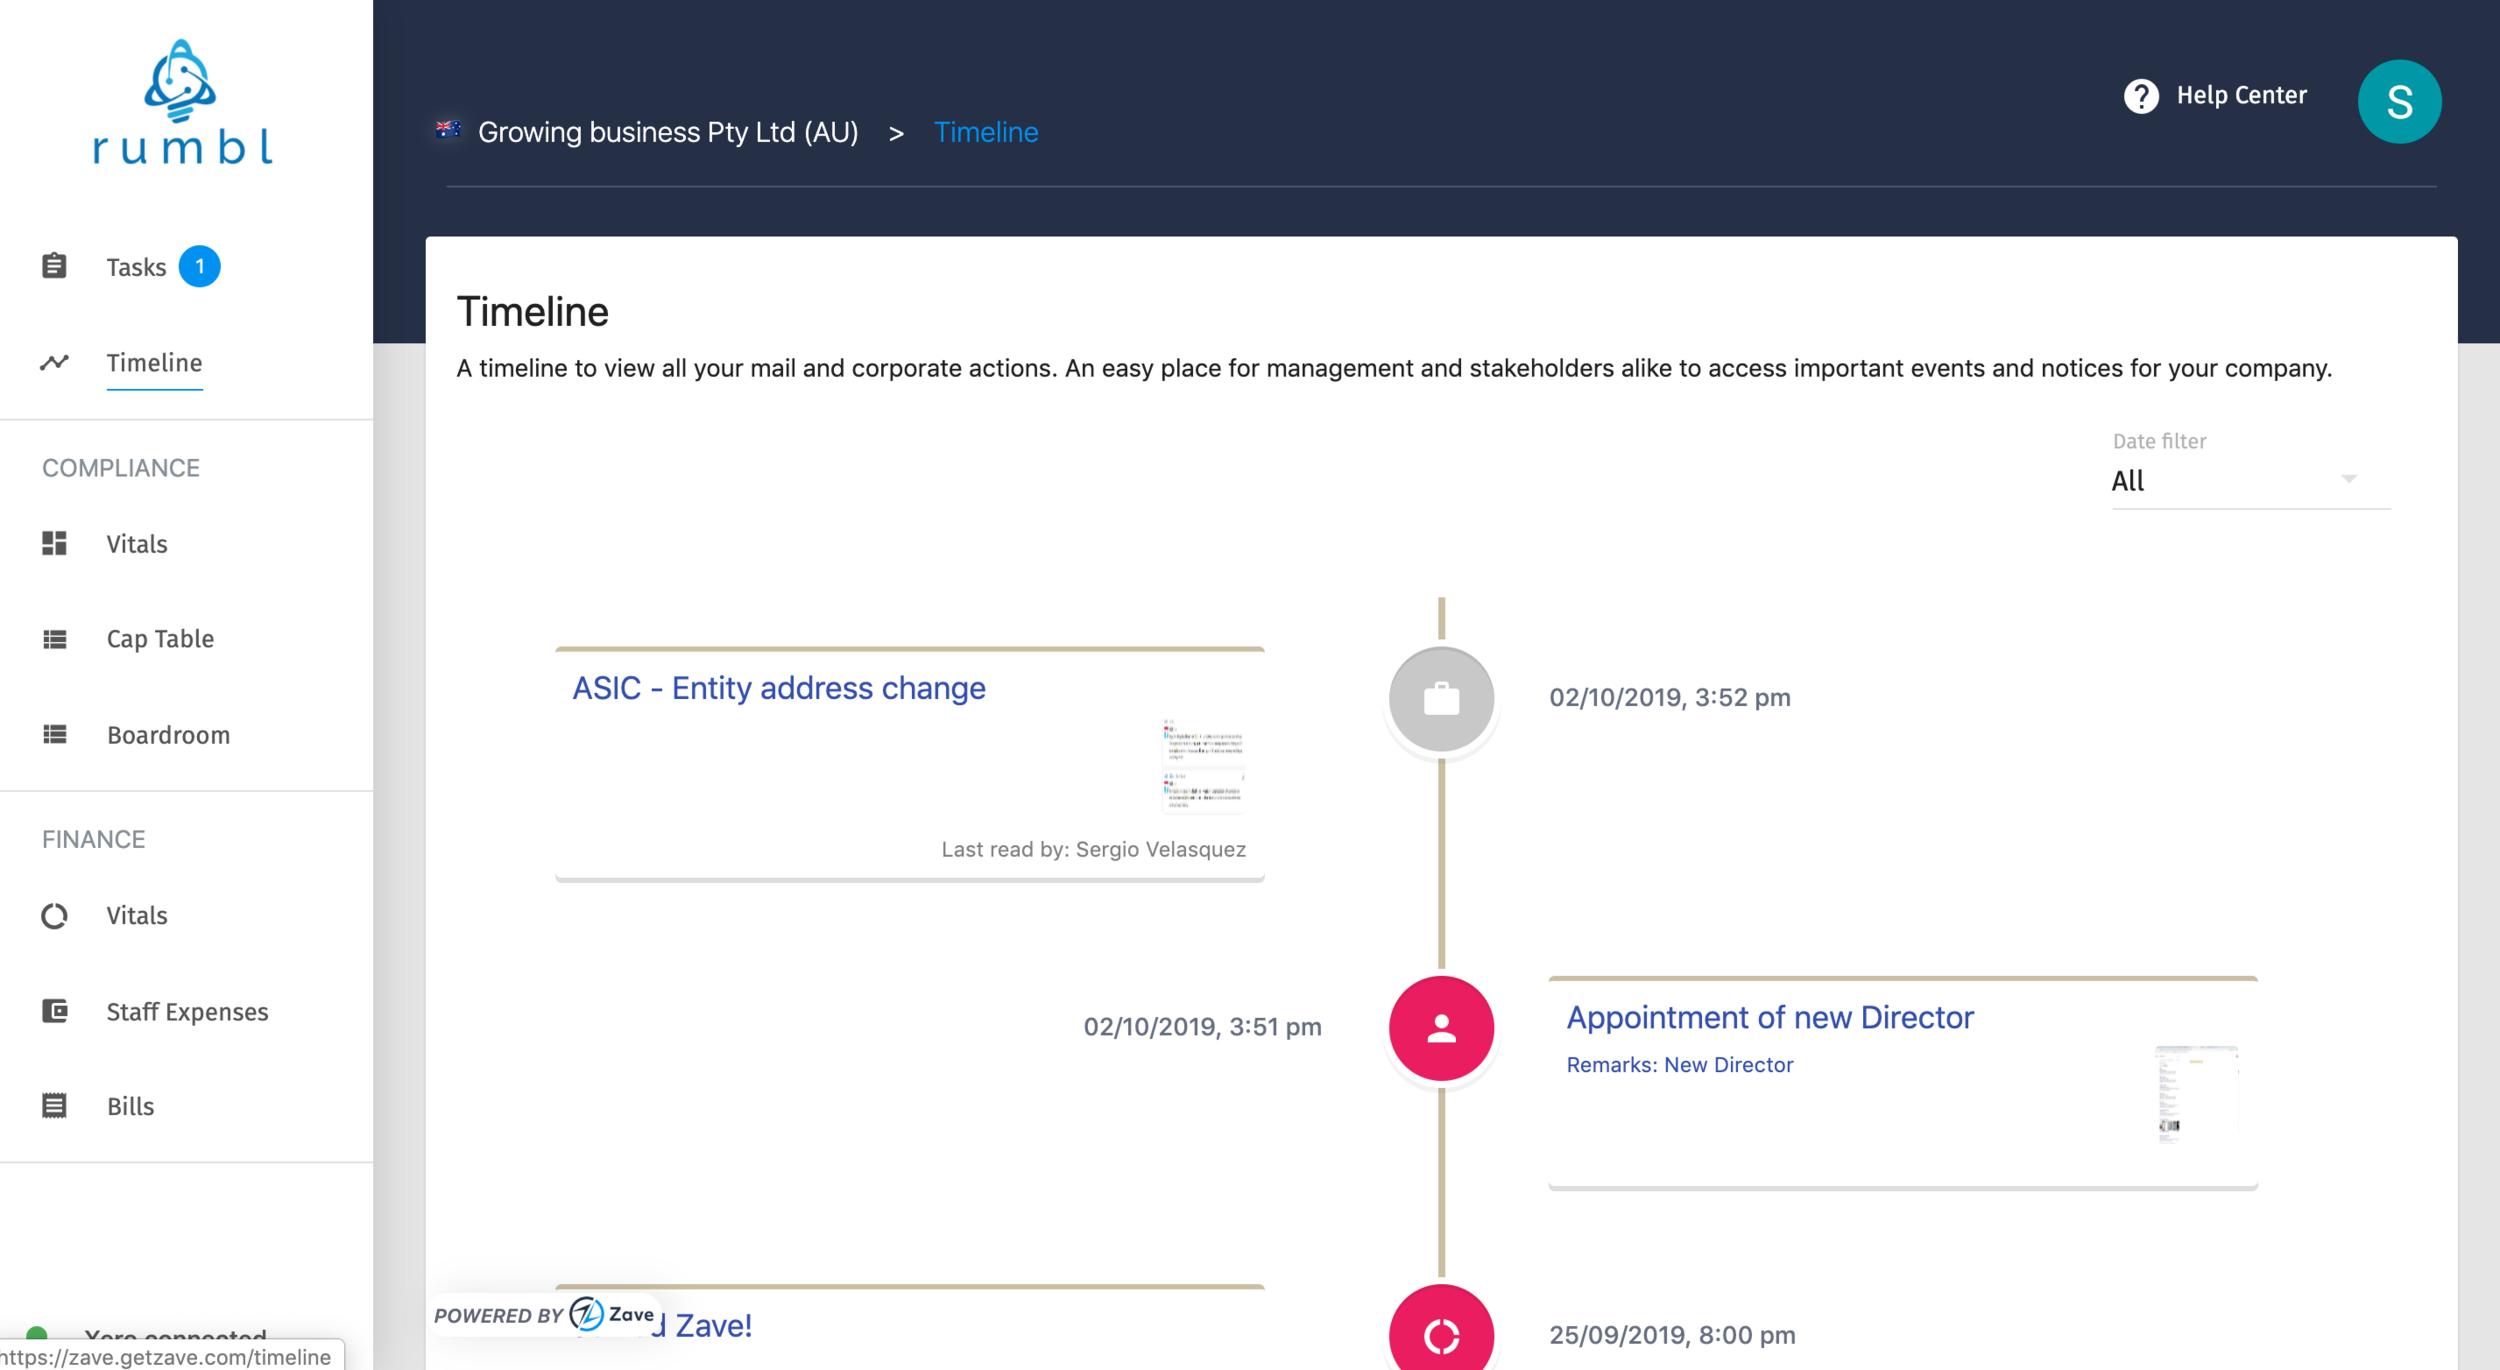 Track key business documents